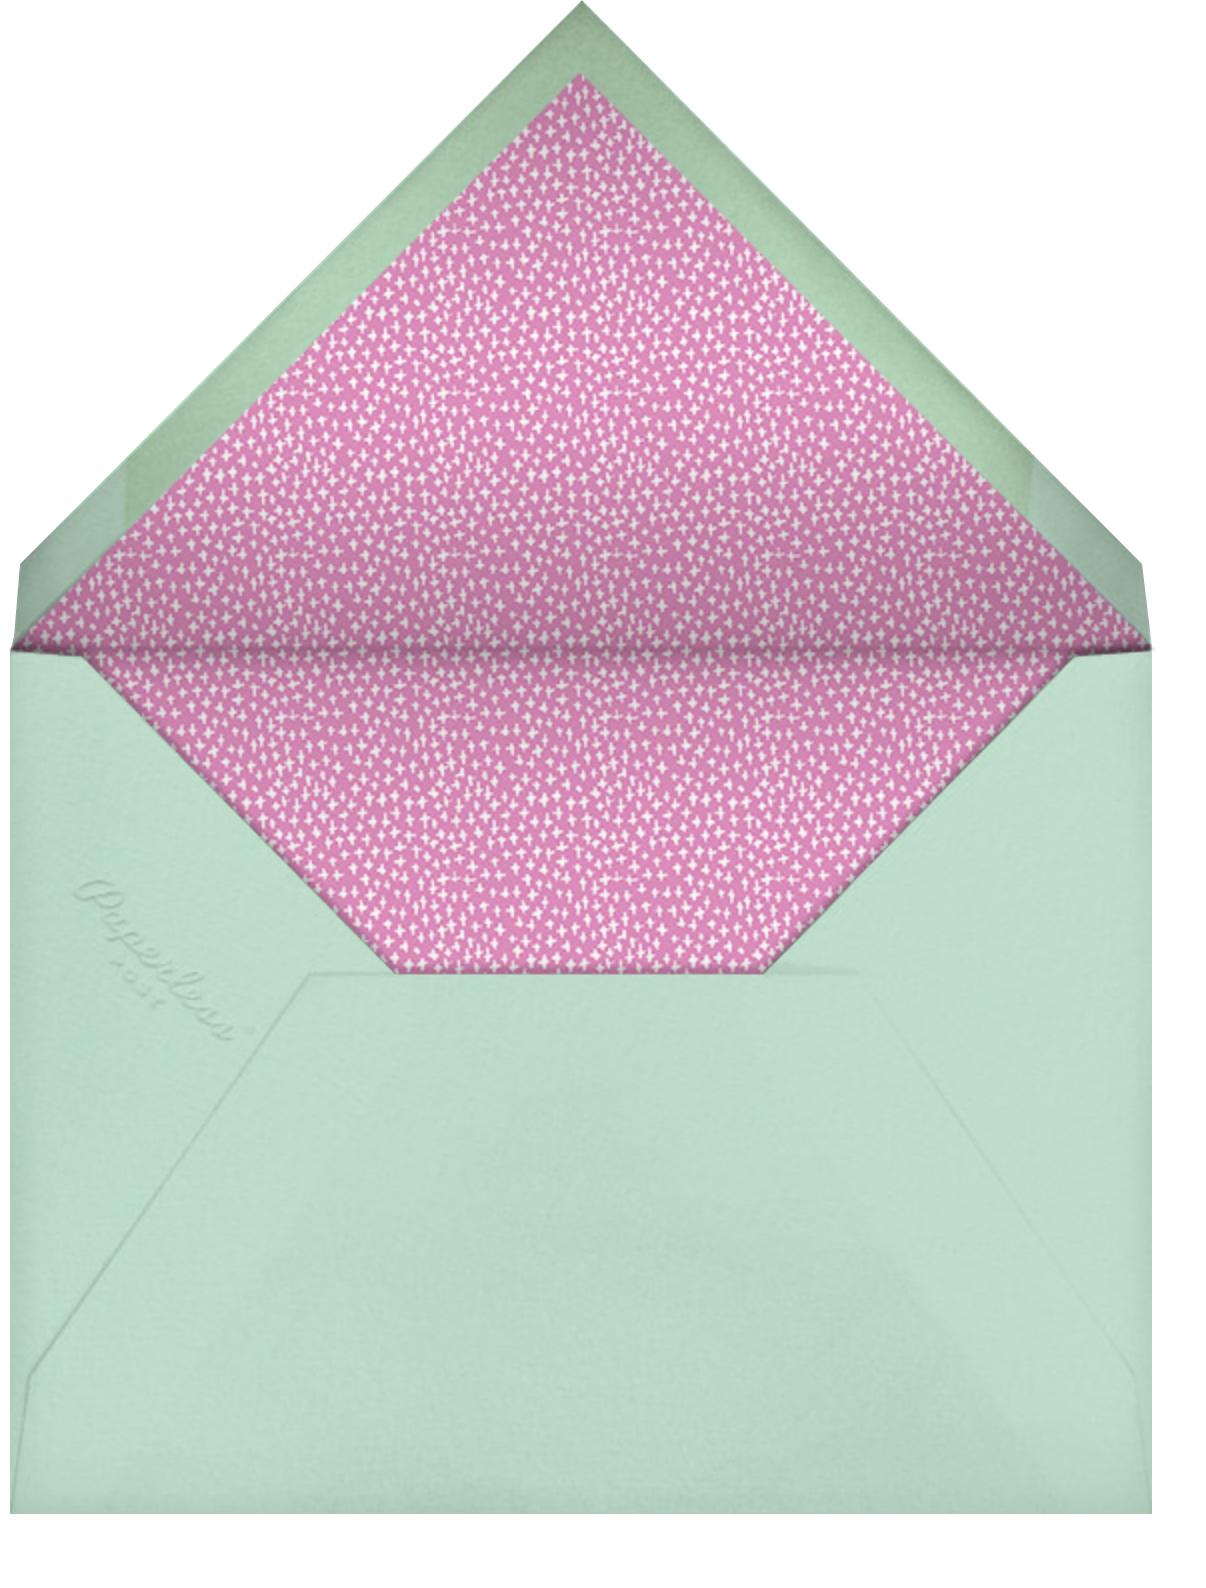 Wild Style (Square) - Blush - Mr. Boddington's Studio - Envelope